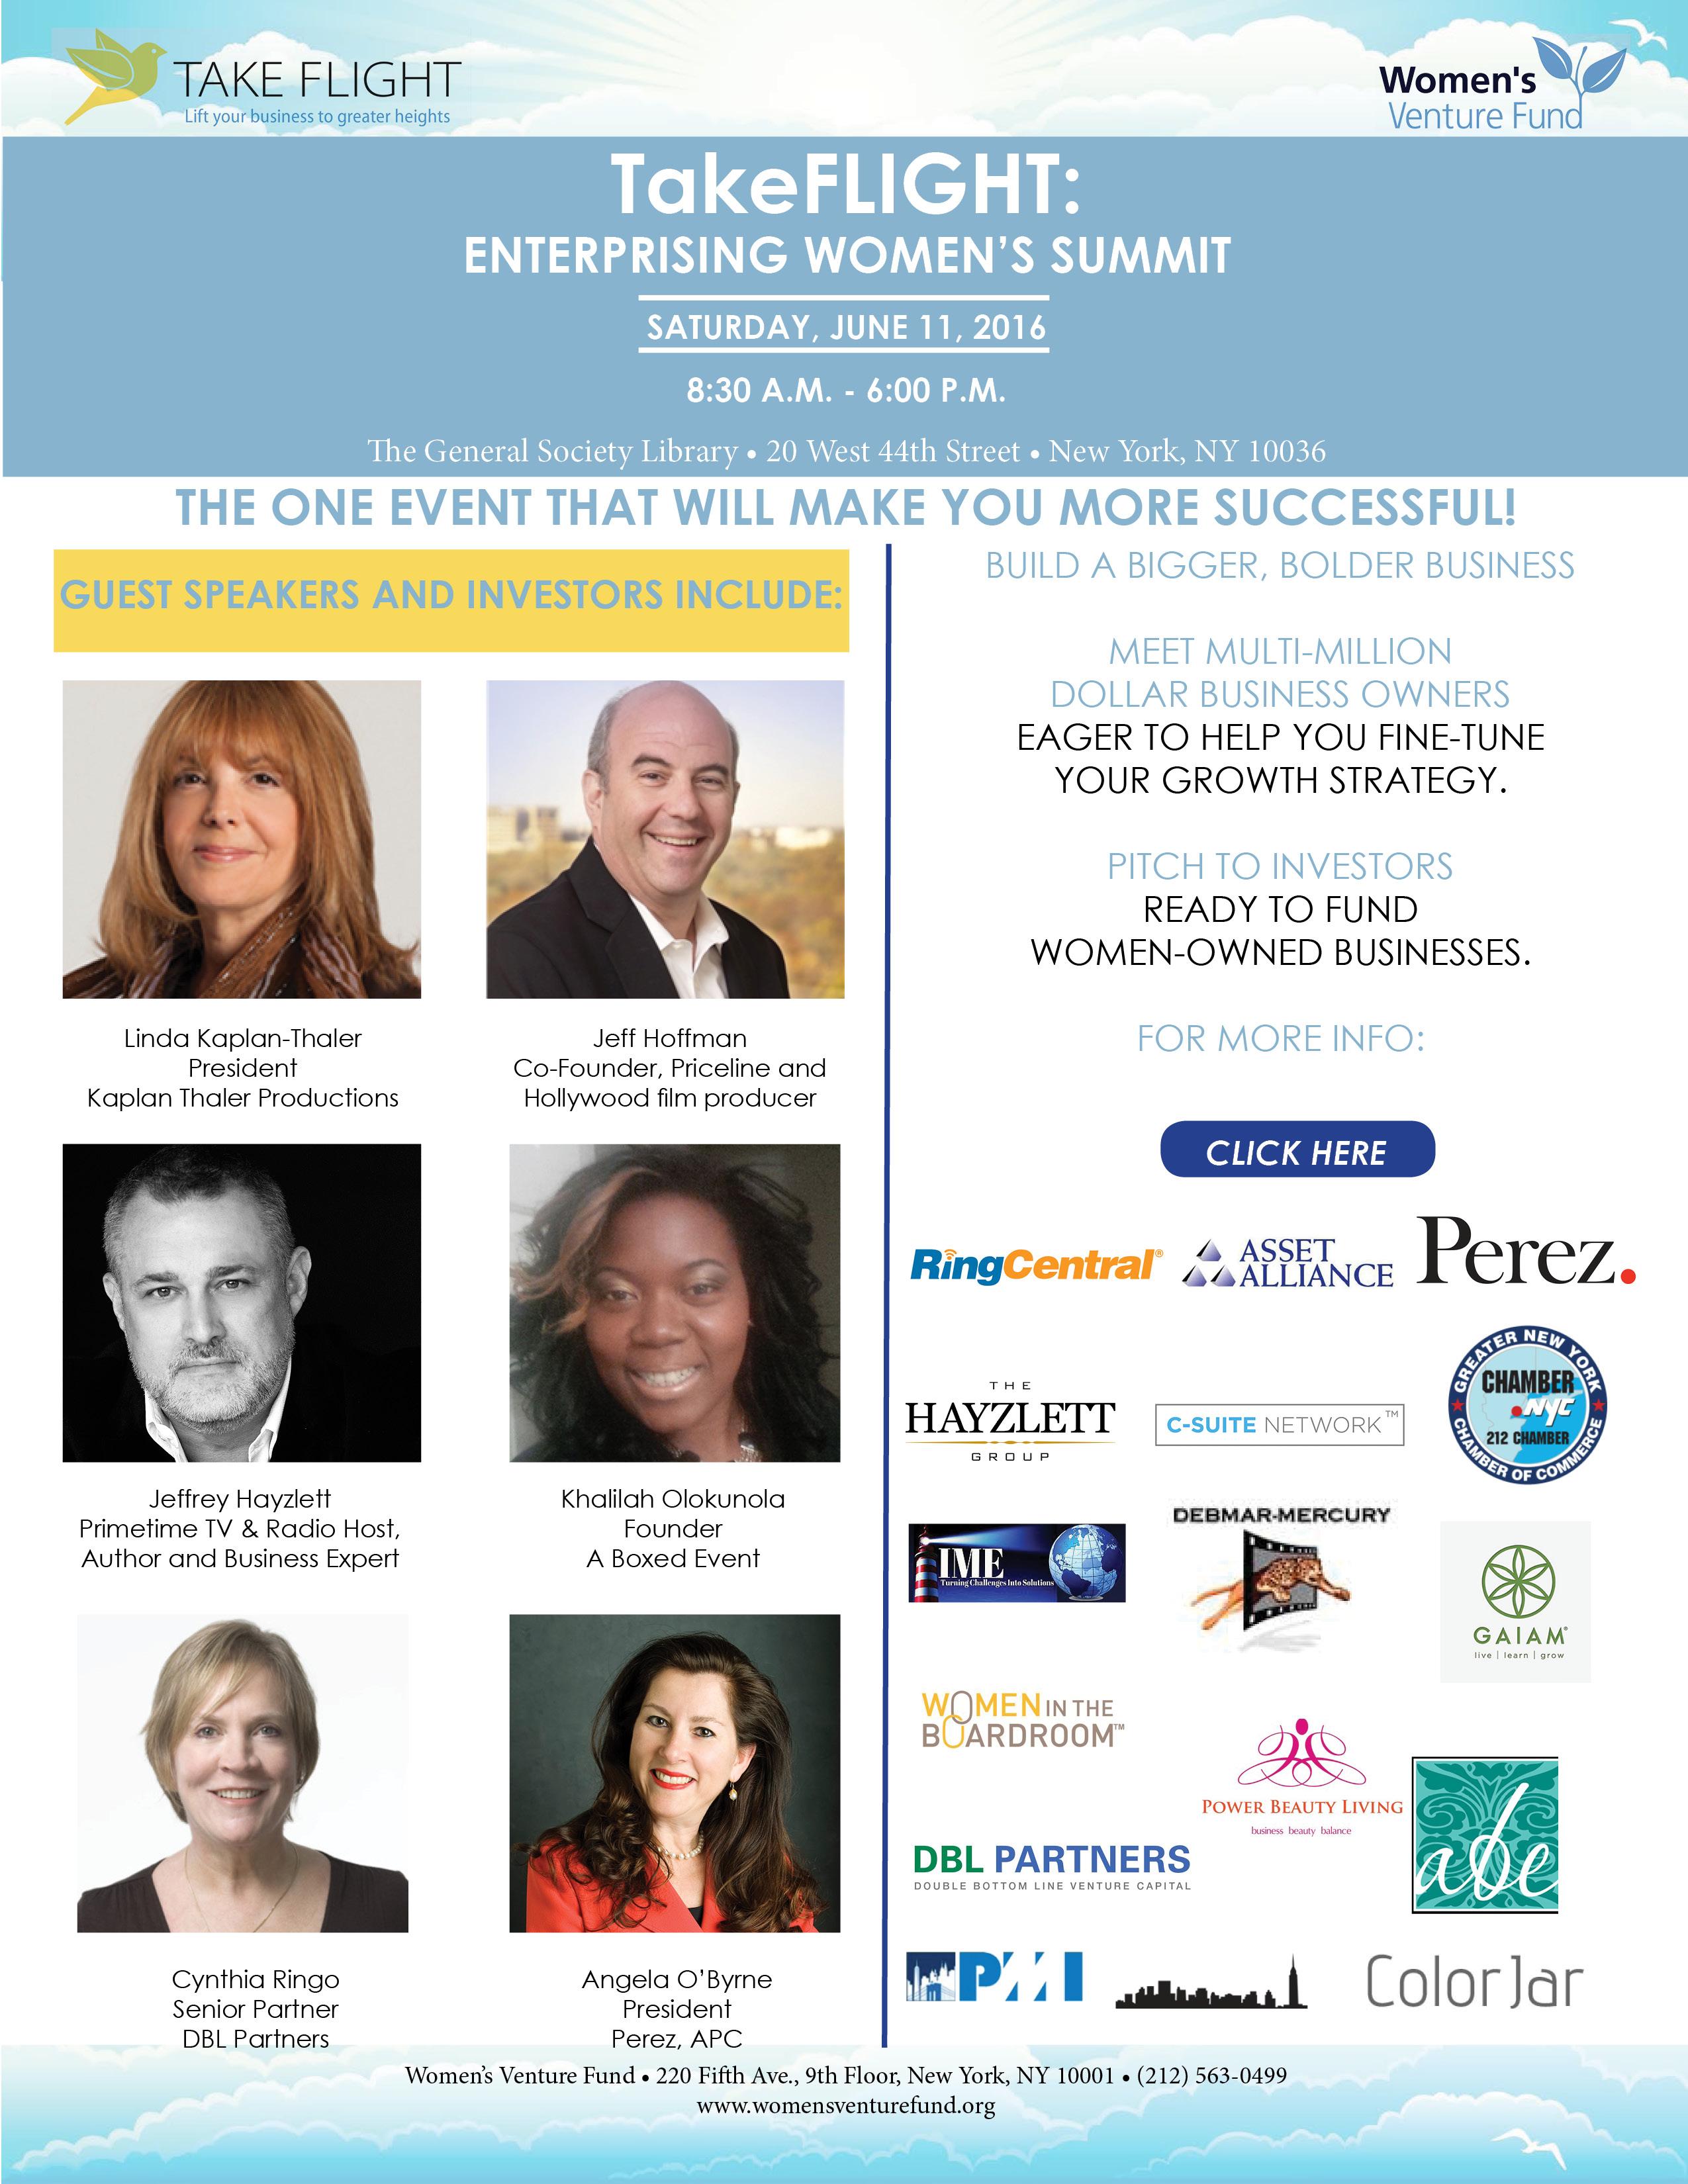 The Women's Venture Fund Announces Conference for Women Entrepreneurs